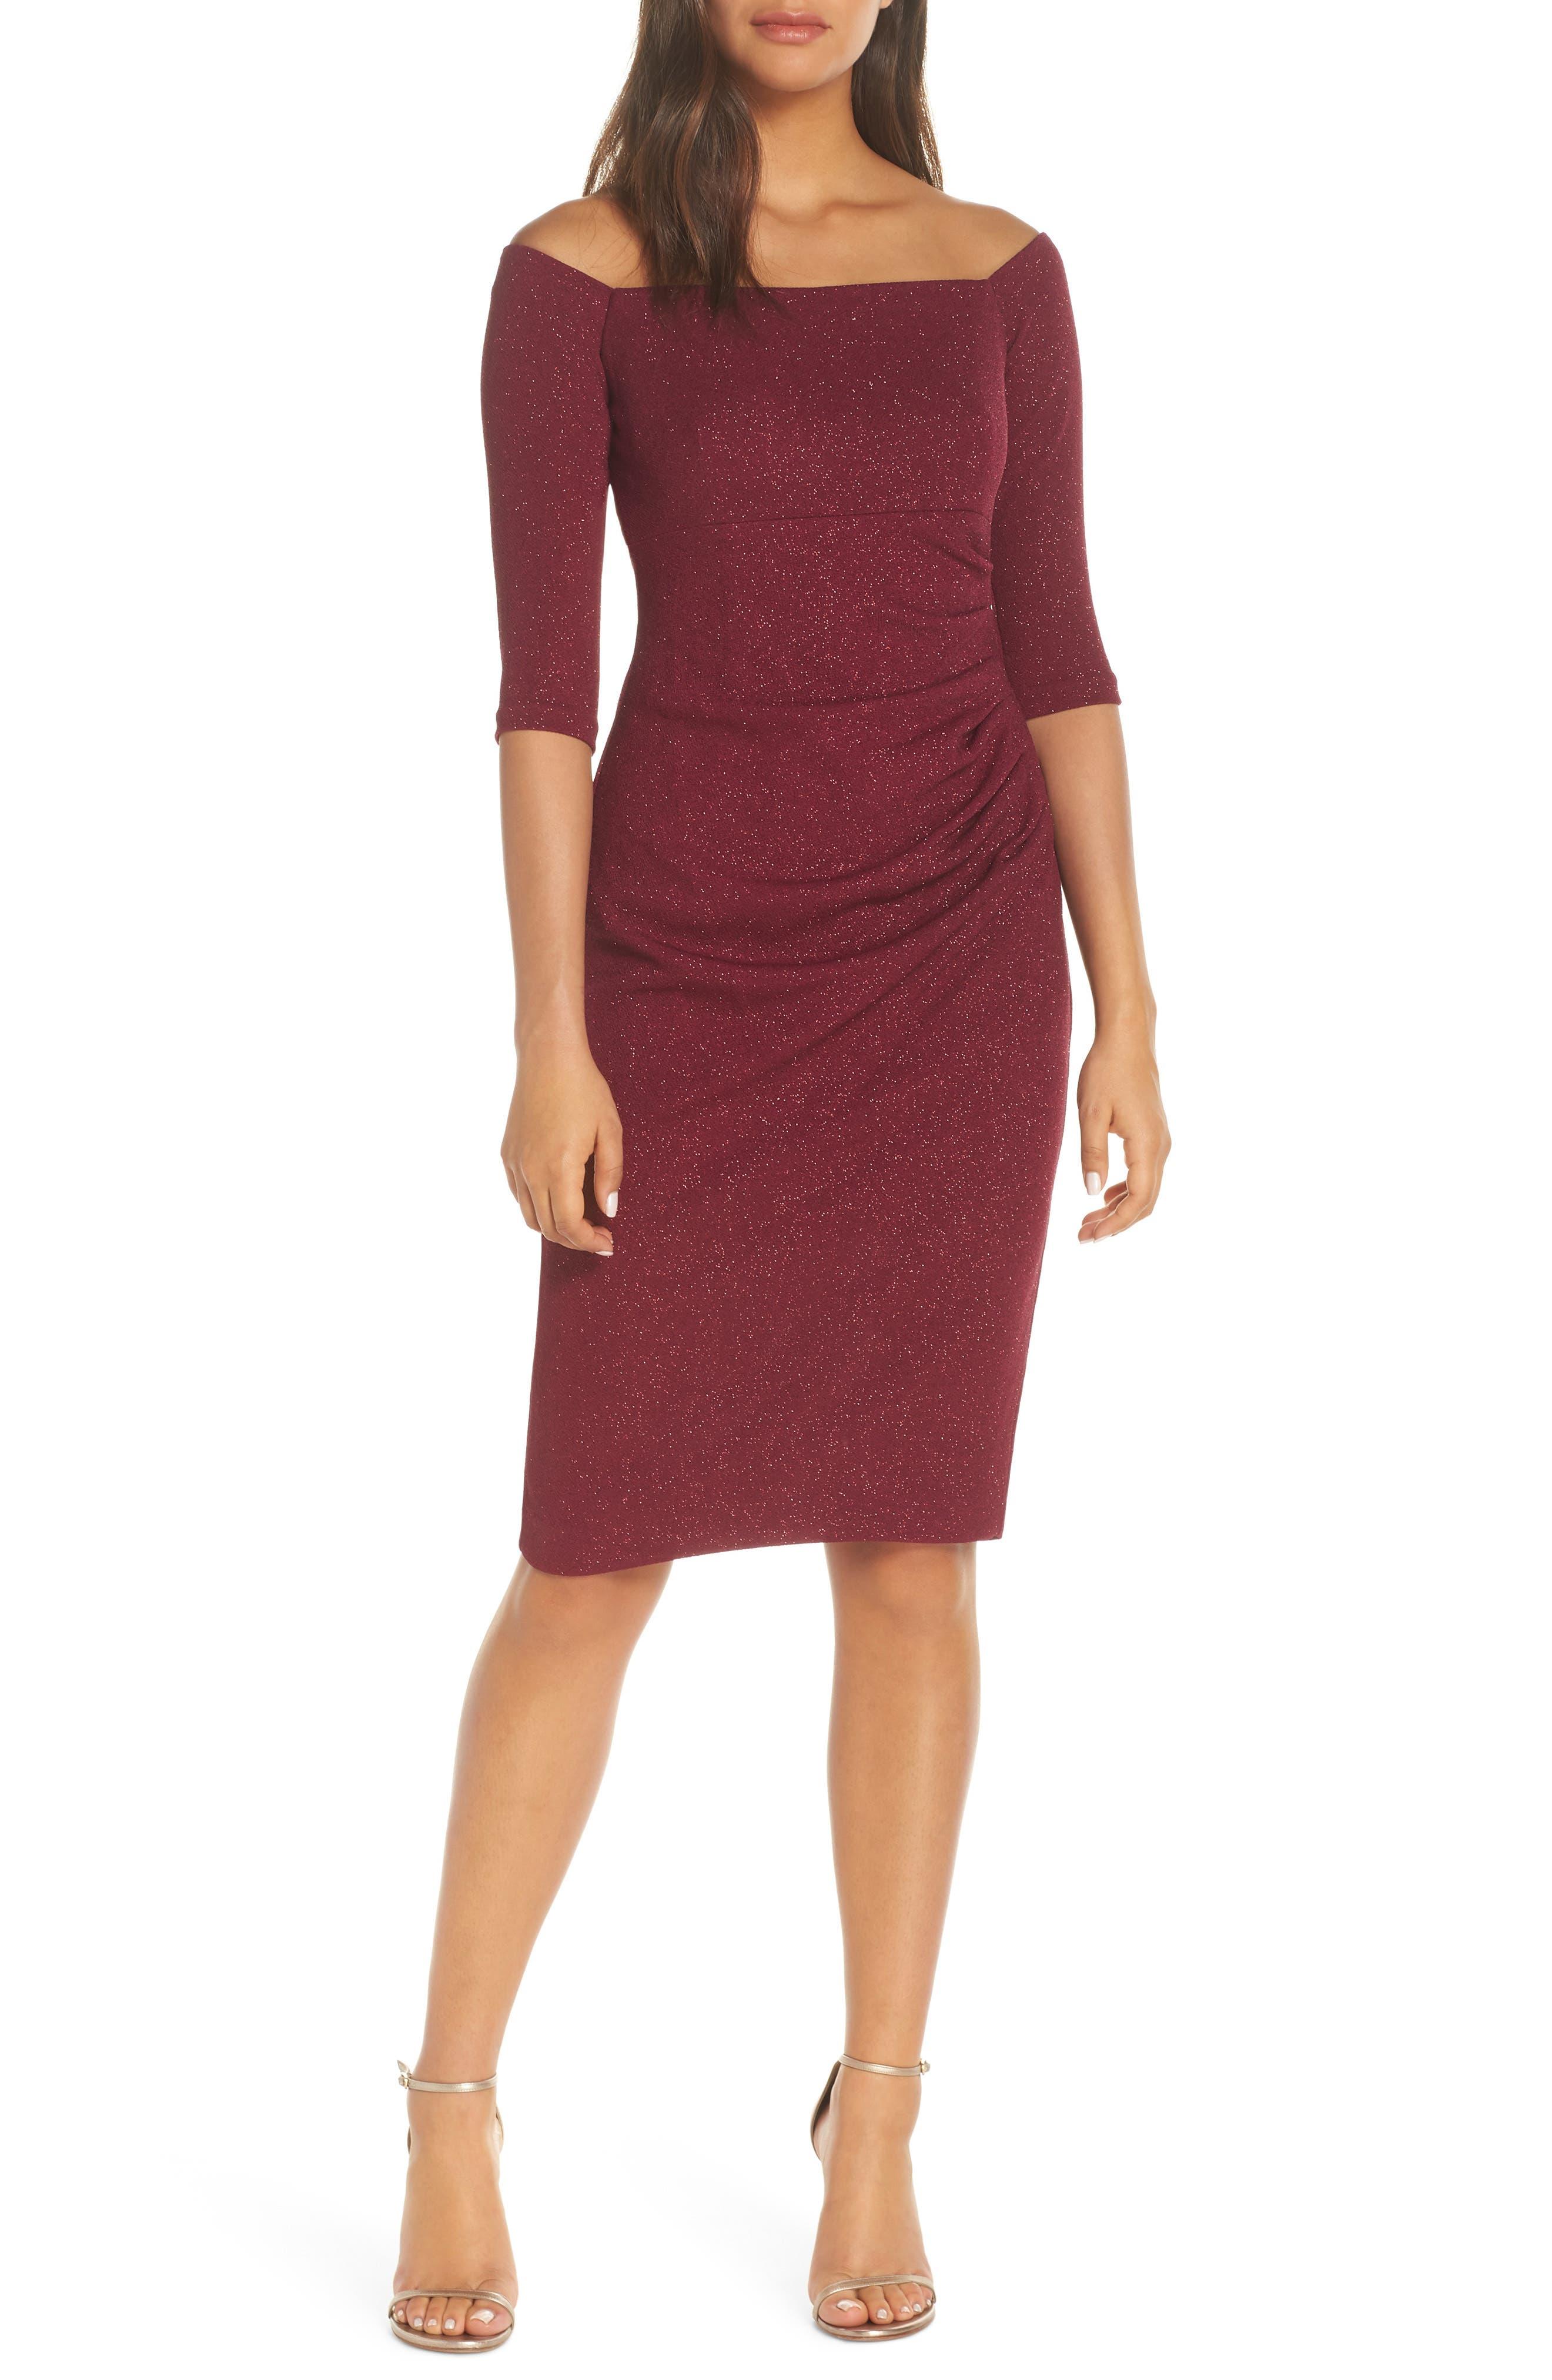 ELIZA J, Off the Shoulder Sheath Dress, Main thumbnail 1, color, WINE